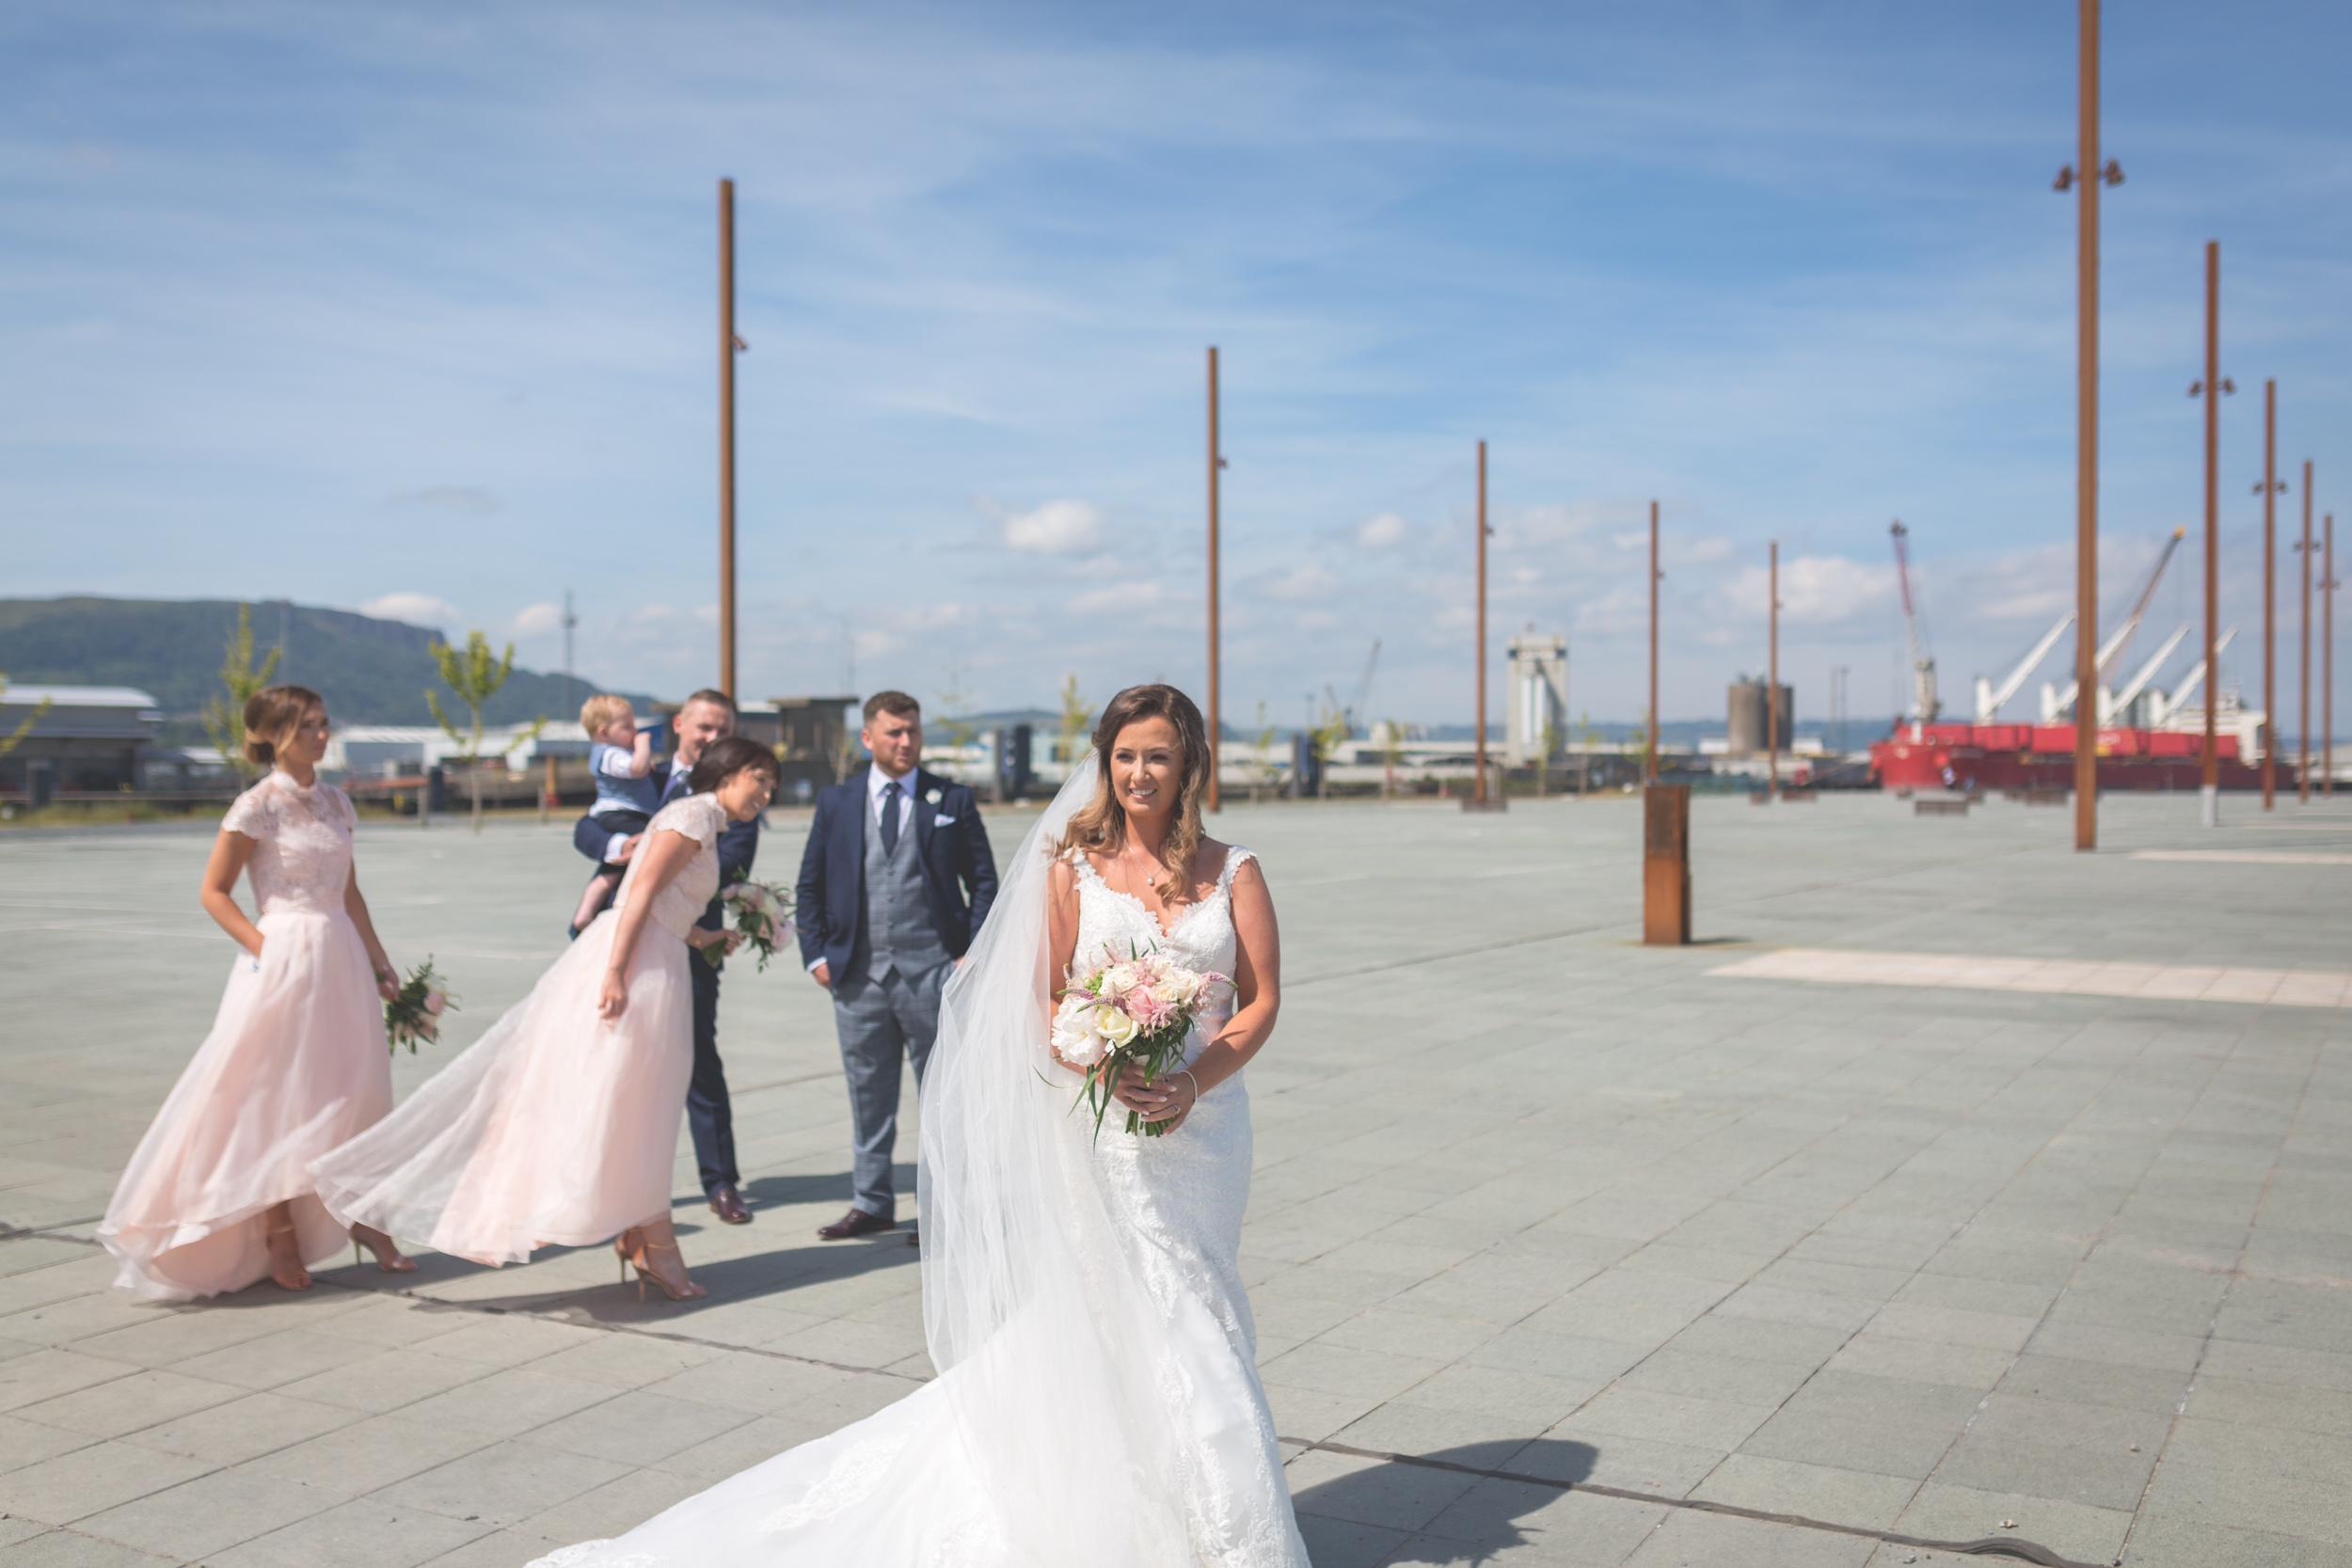 Brian McEwan   Northern Ireland Wedding Photographer   Rebecca & Michael   Portraits-44.jpg